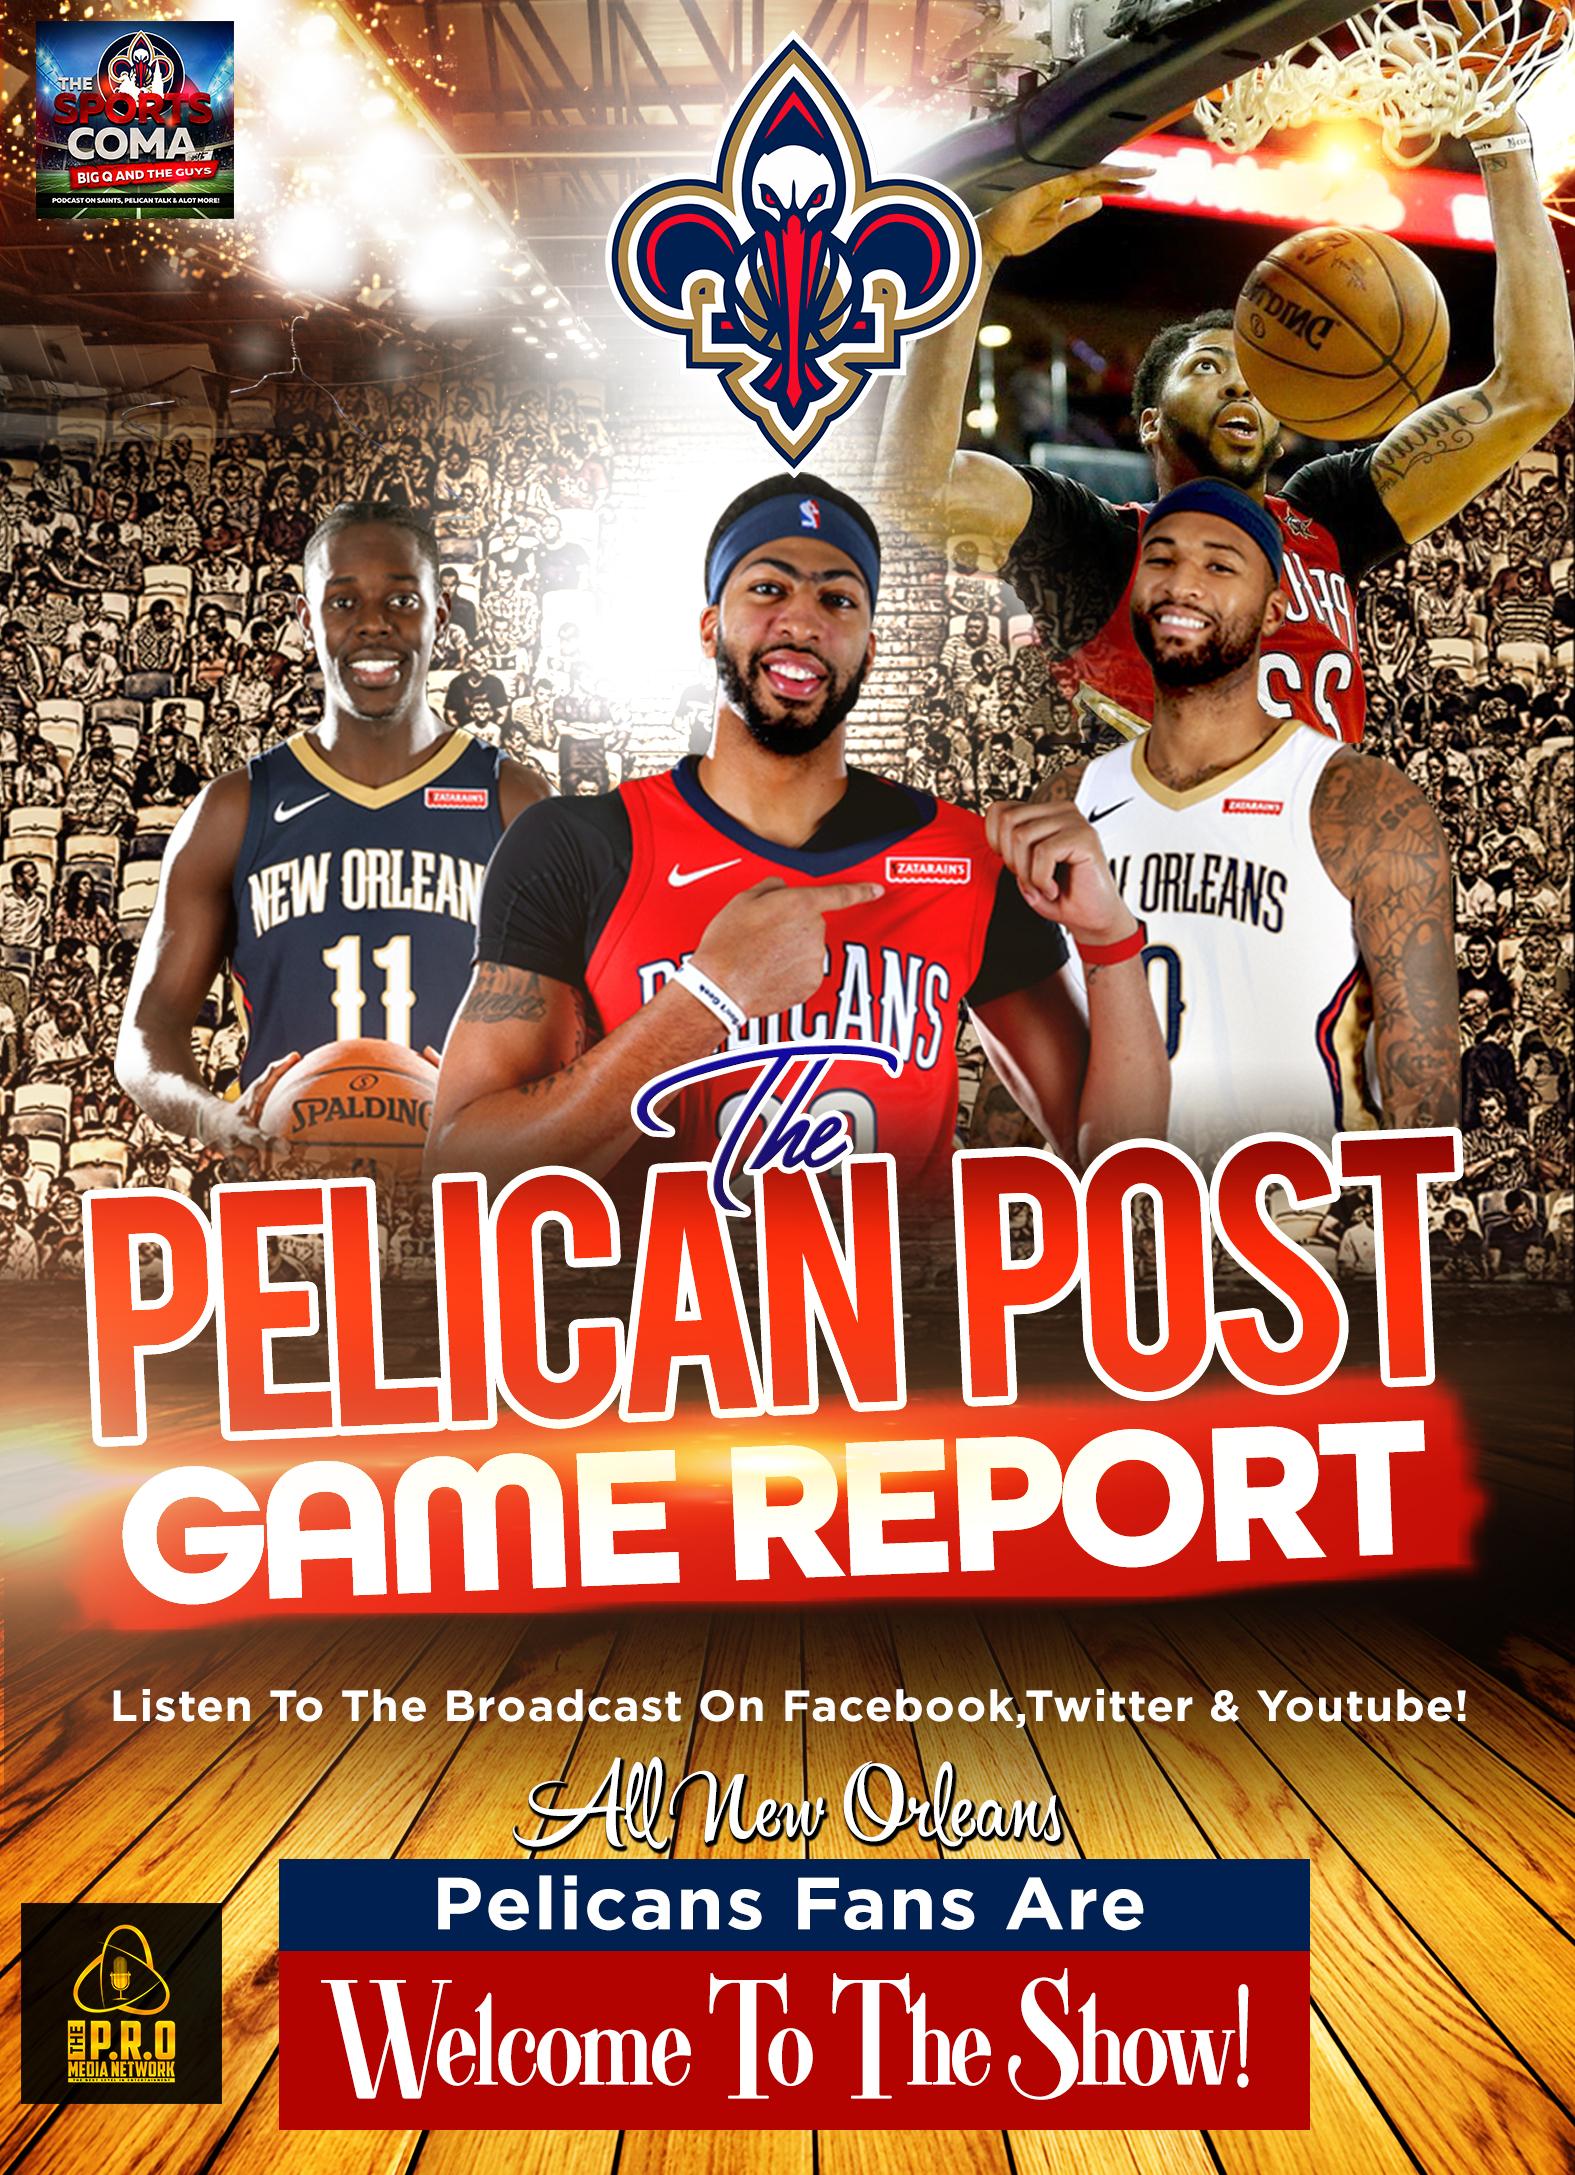 Pelican Post Game Report #173 Pelicans VS Memphis Grizzles Recap, Phoenix Suns Preview & More...